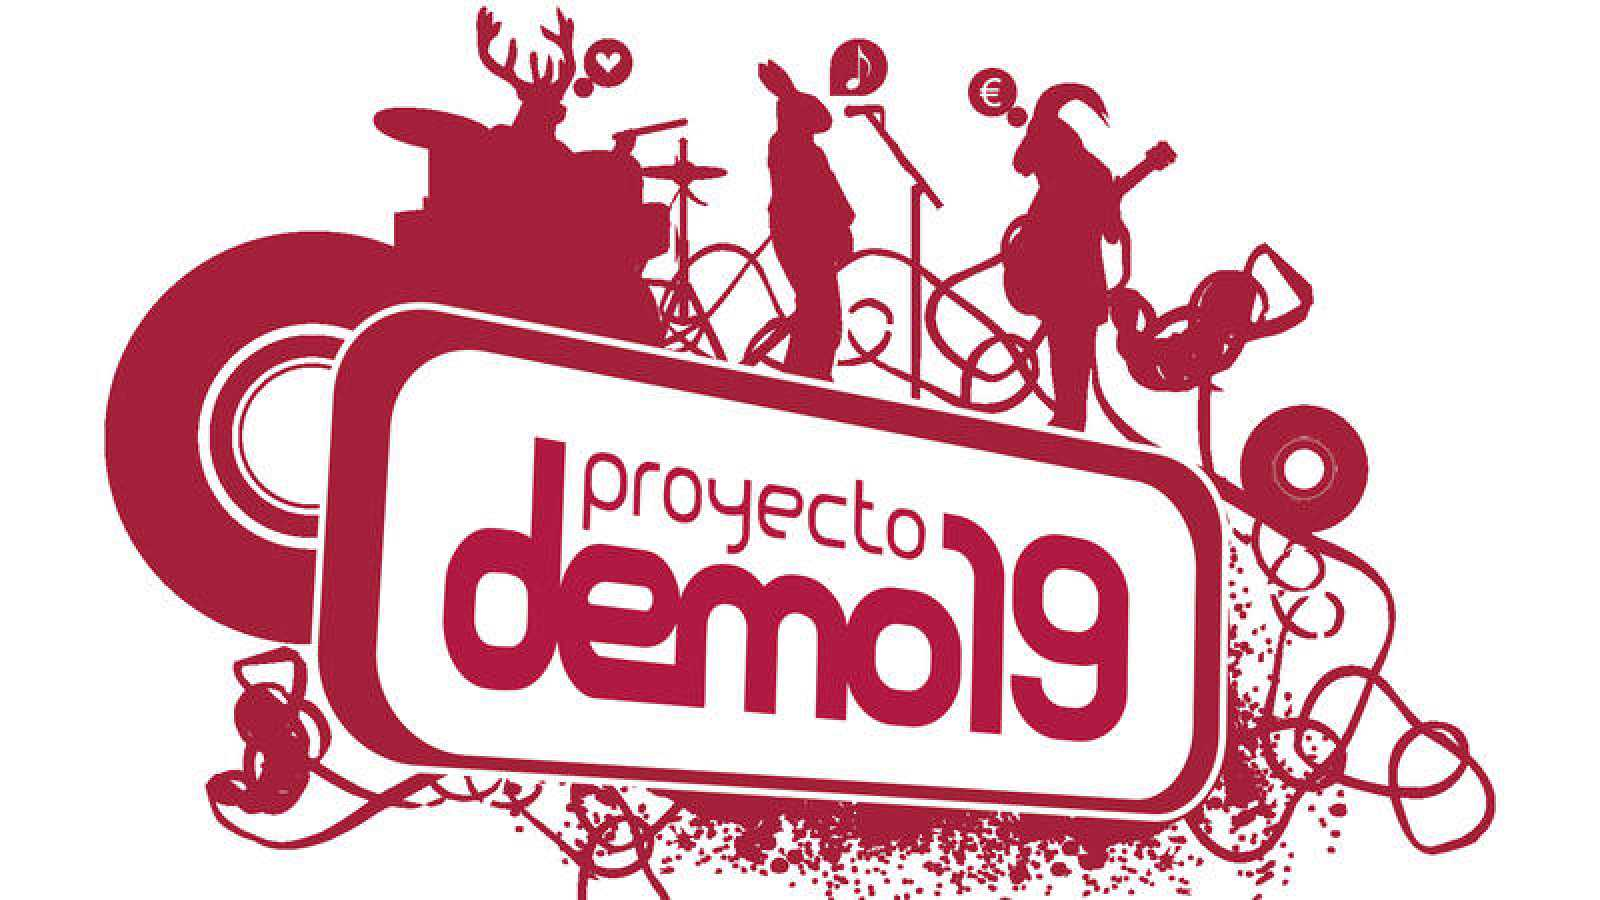 proyecto demo logo 2019